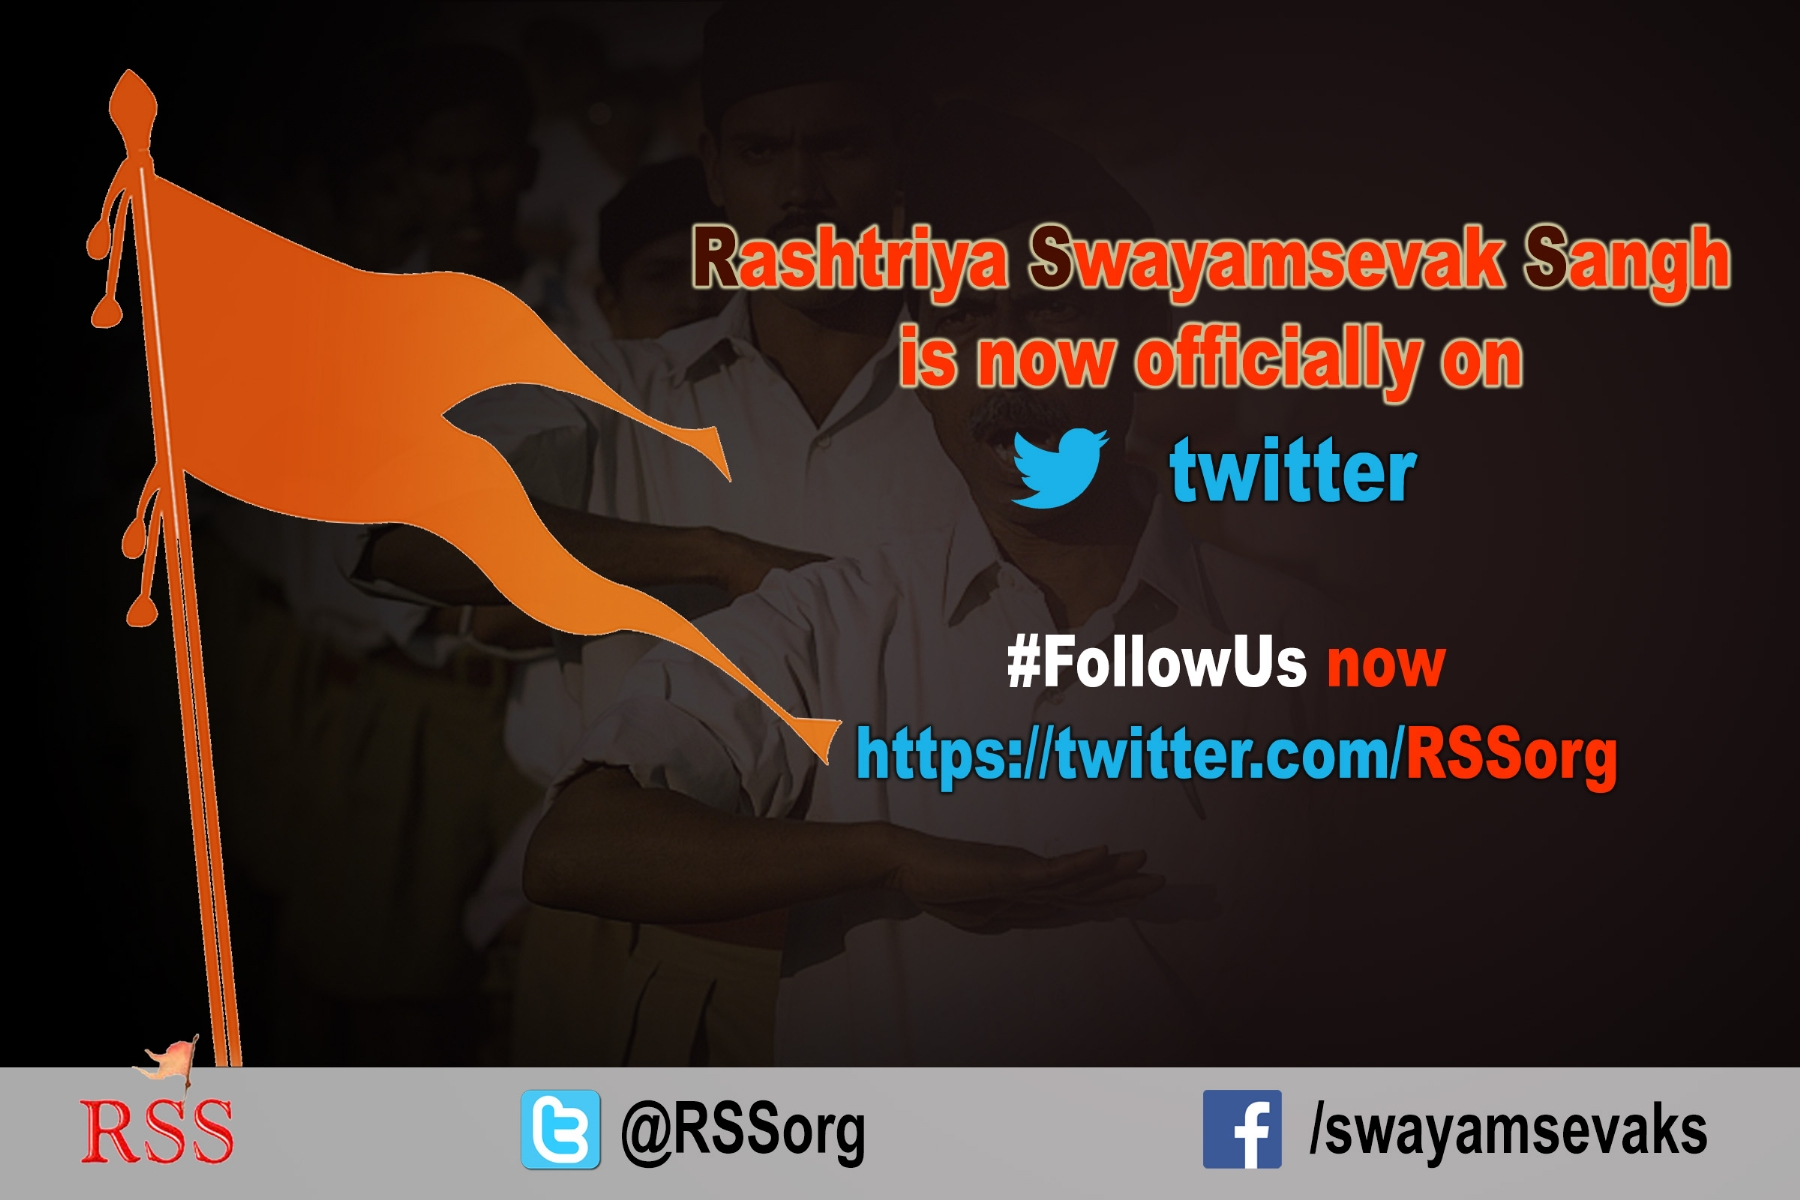 RSS on twitter